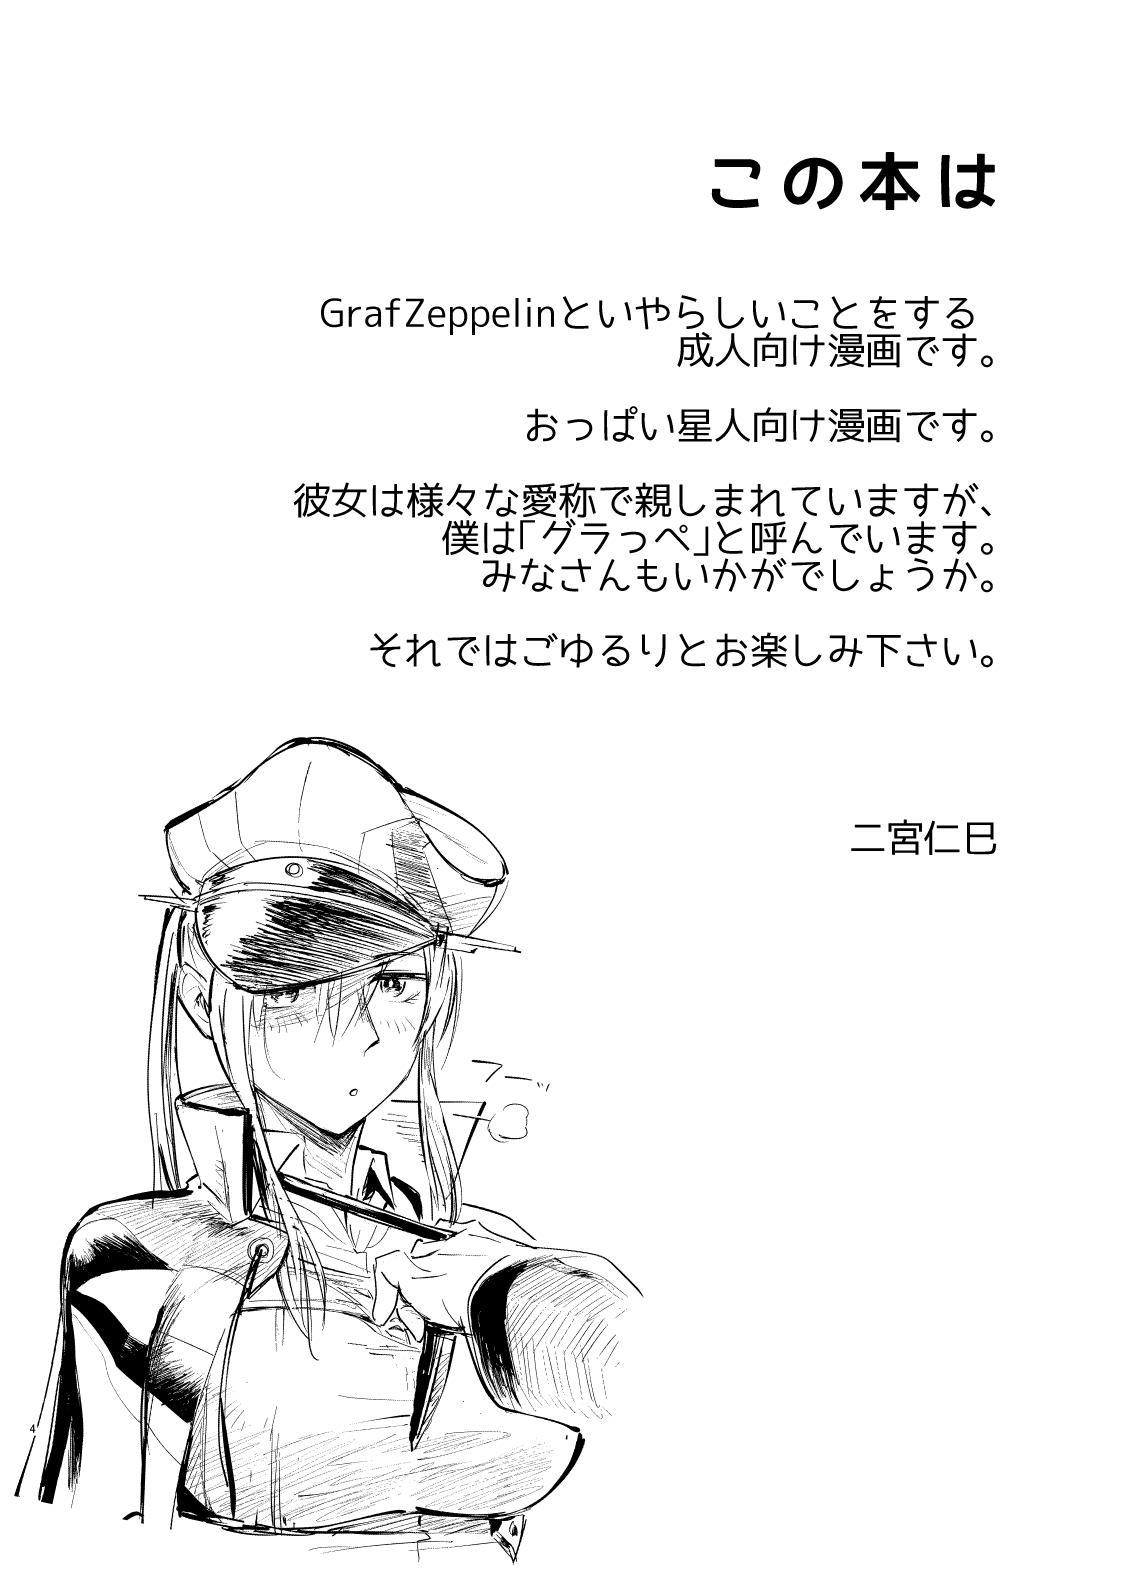 Chi, Chigaun da Admiral Kore wa 2